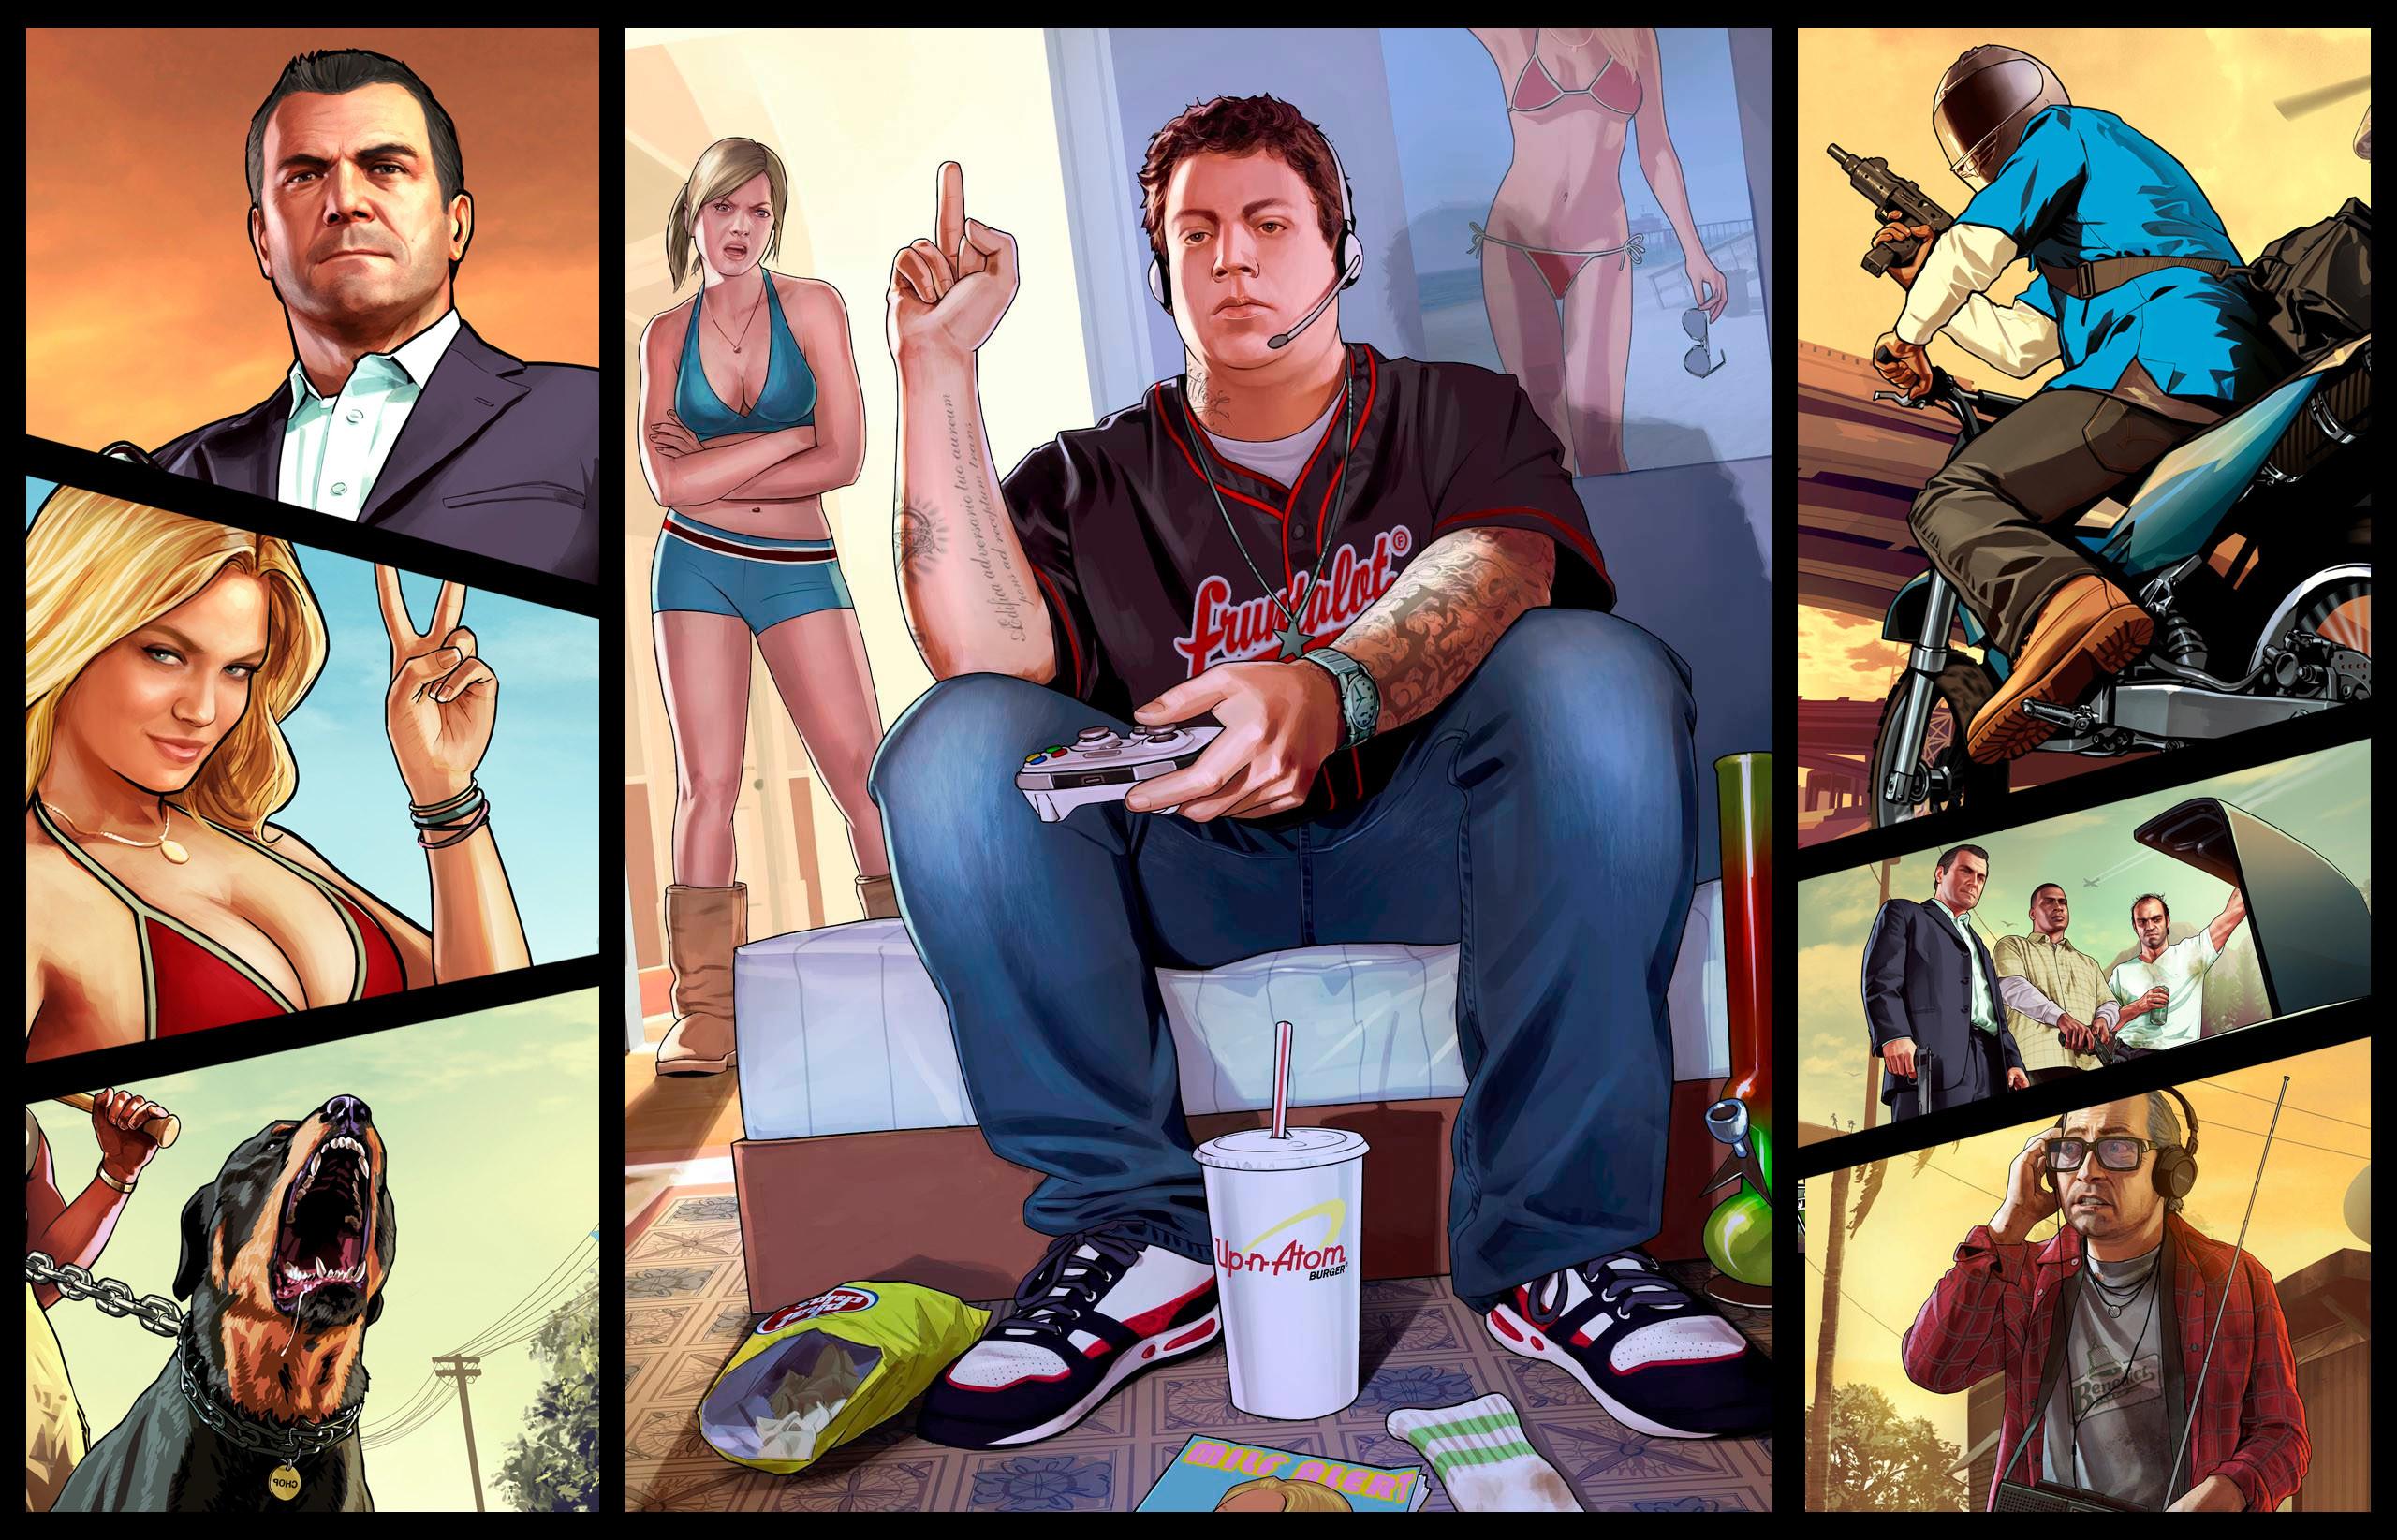 Grand theft auto wallpaper 73 images 1920x1200 1920x1200 wallpaper gta v grand theft auto v game bridge logo voltagebd Image collections